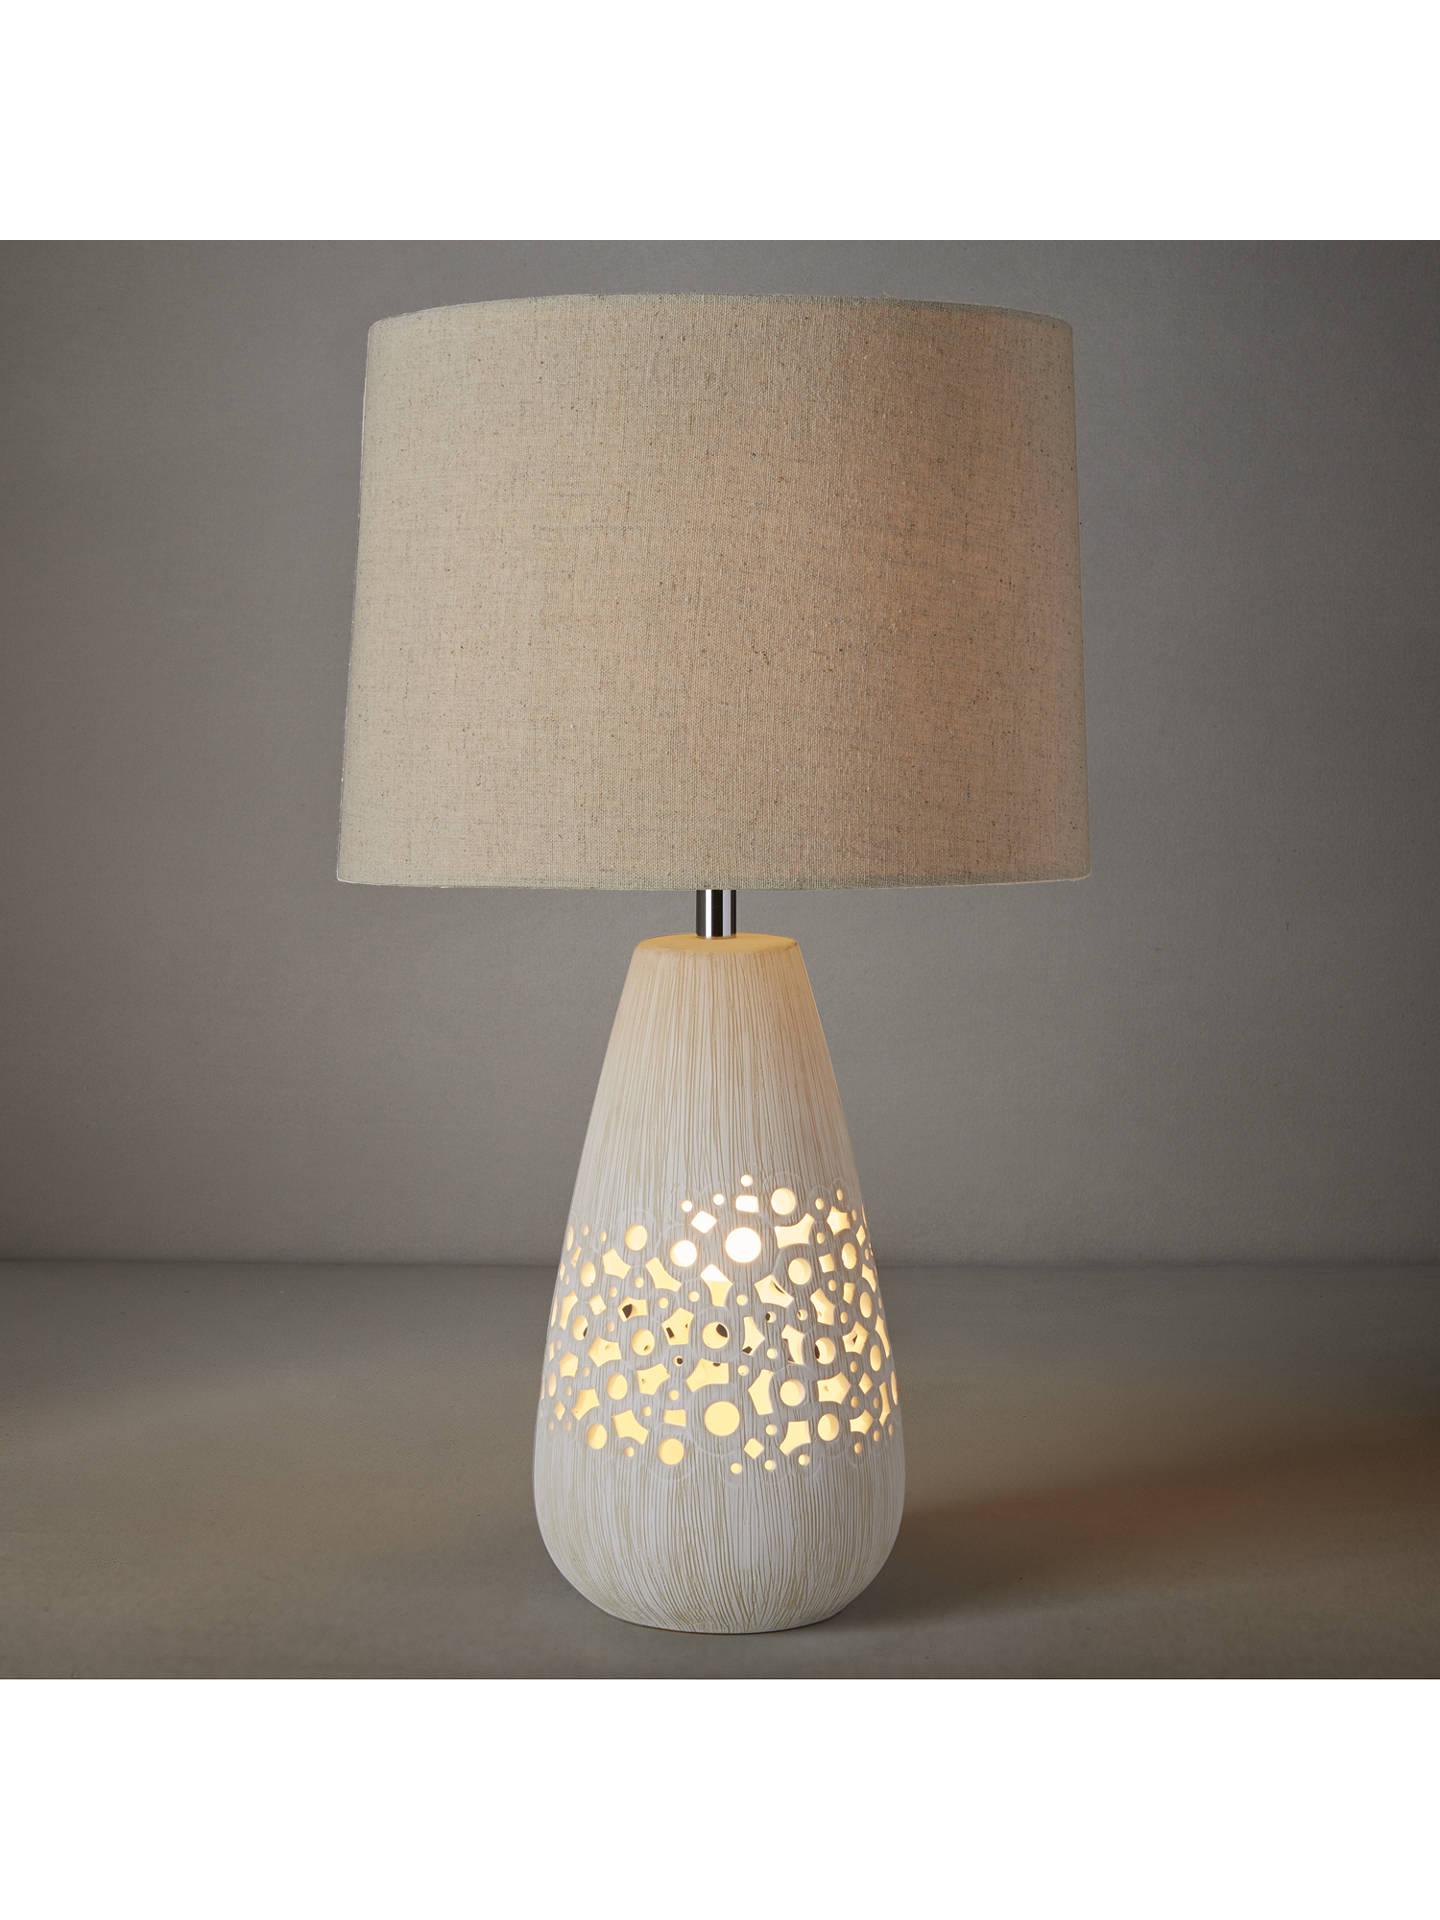 John lewis melissa dual lit ceramic table lamp at john lewis partners buyjohn lewis melissa dual lit ceramic table lamp online at johnlewis aloadofball Choice Image